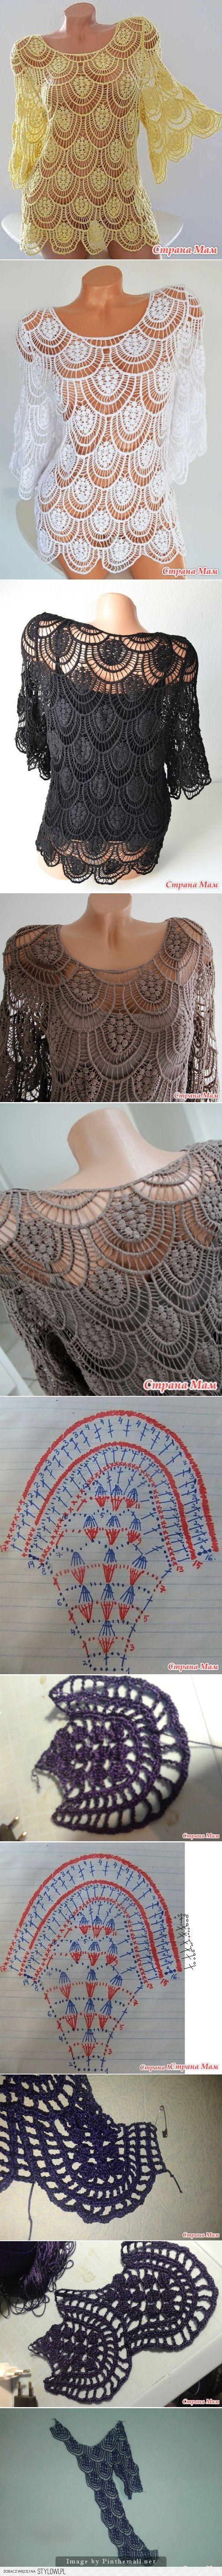 túnica gancho / ganchillo en Stylowi.pl | teresa | Pinterest ...